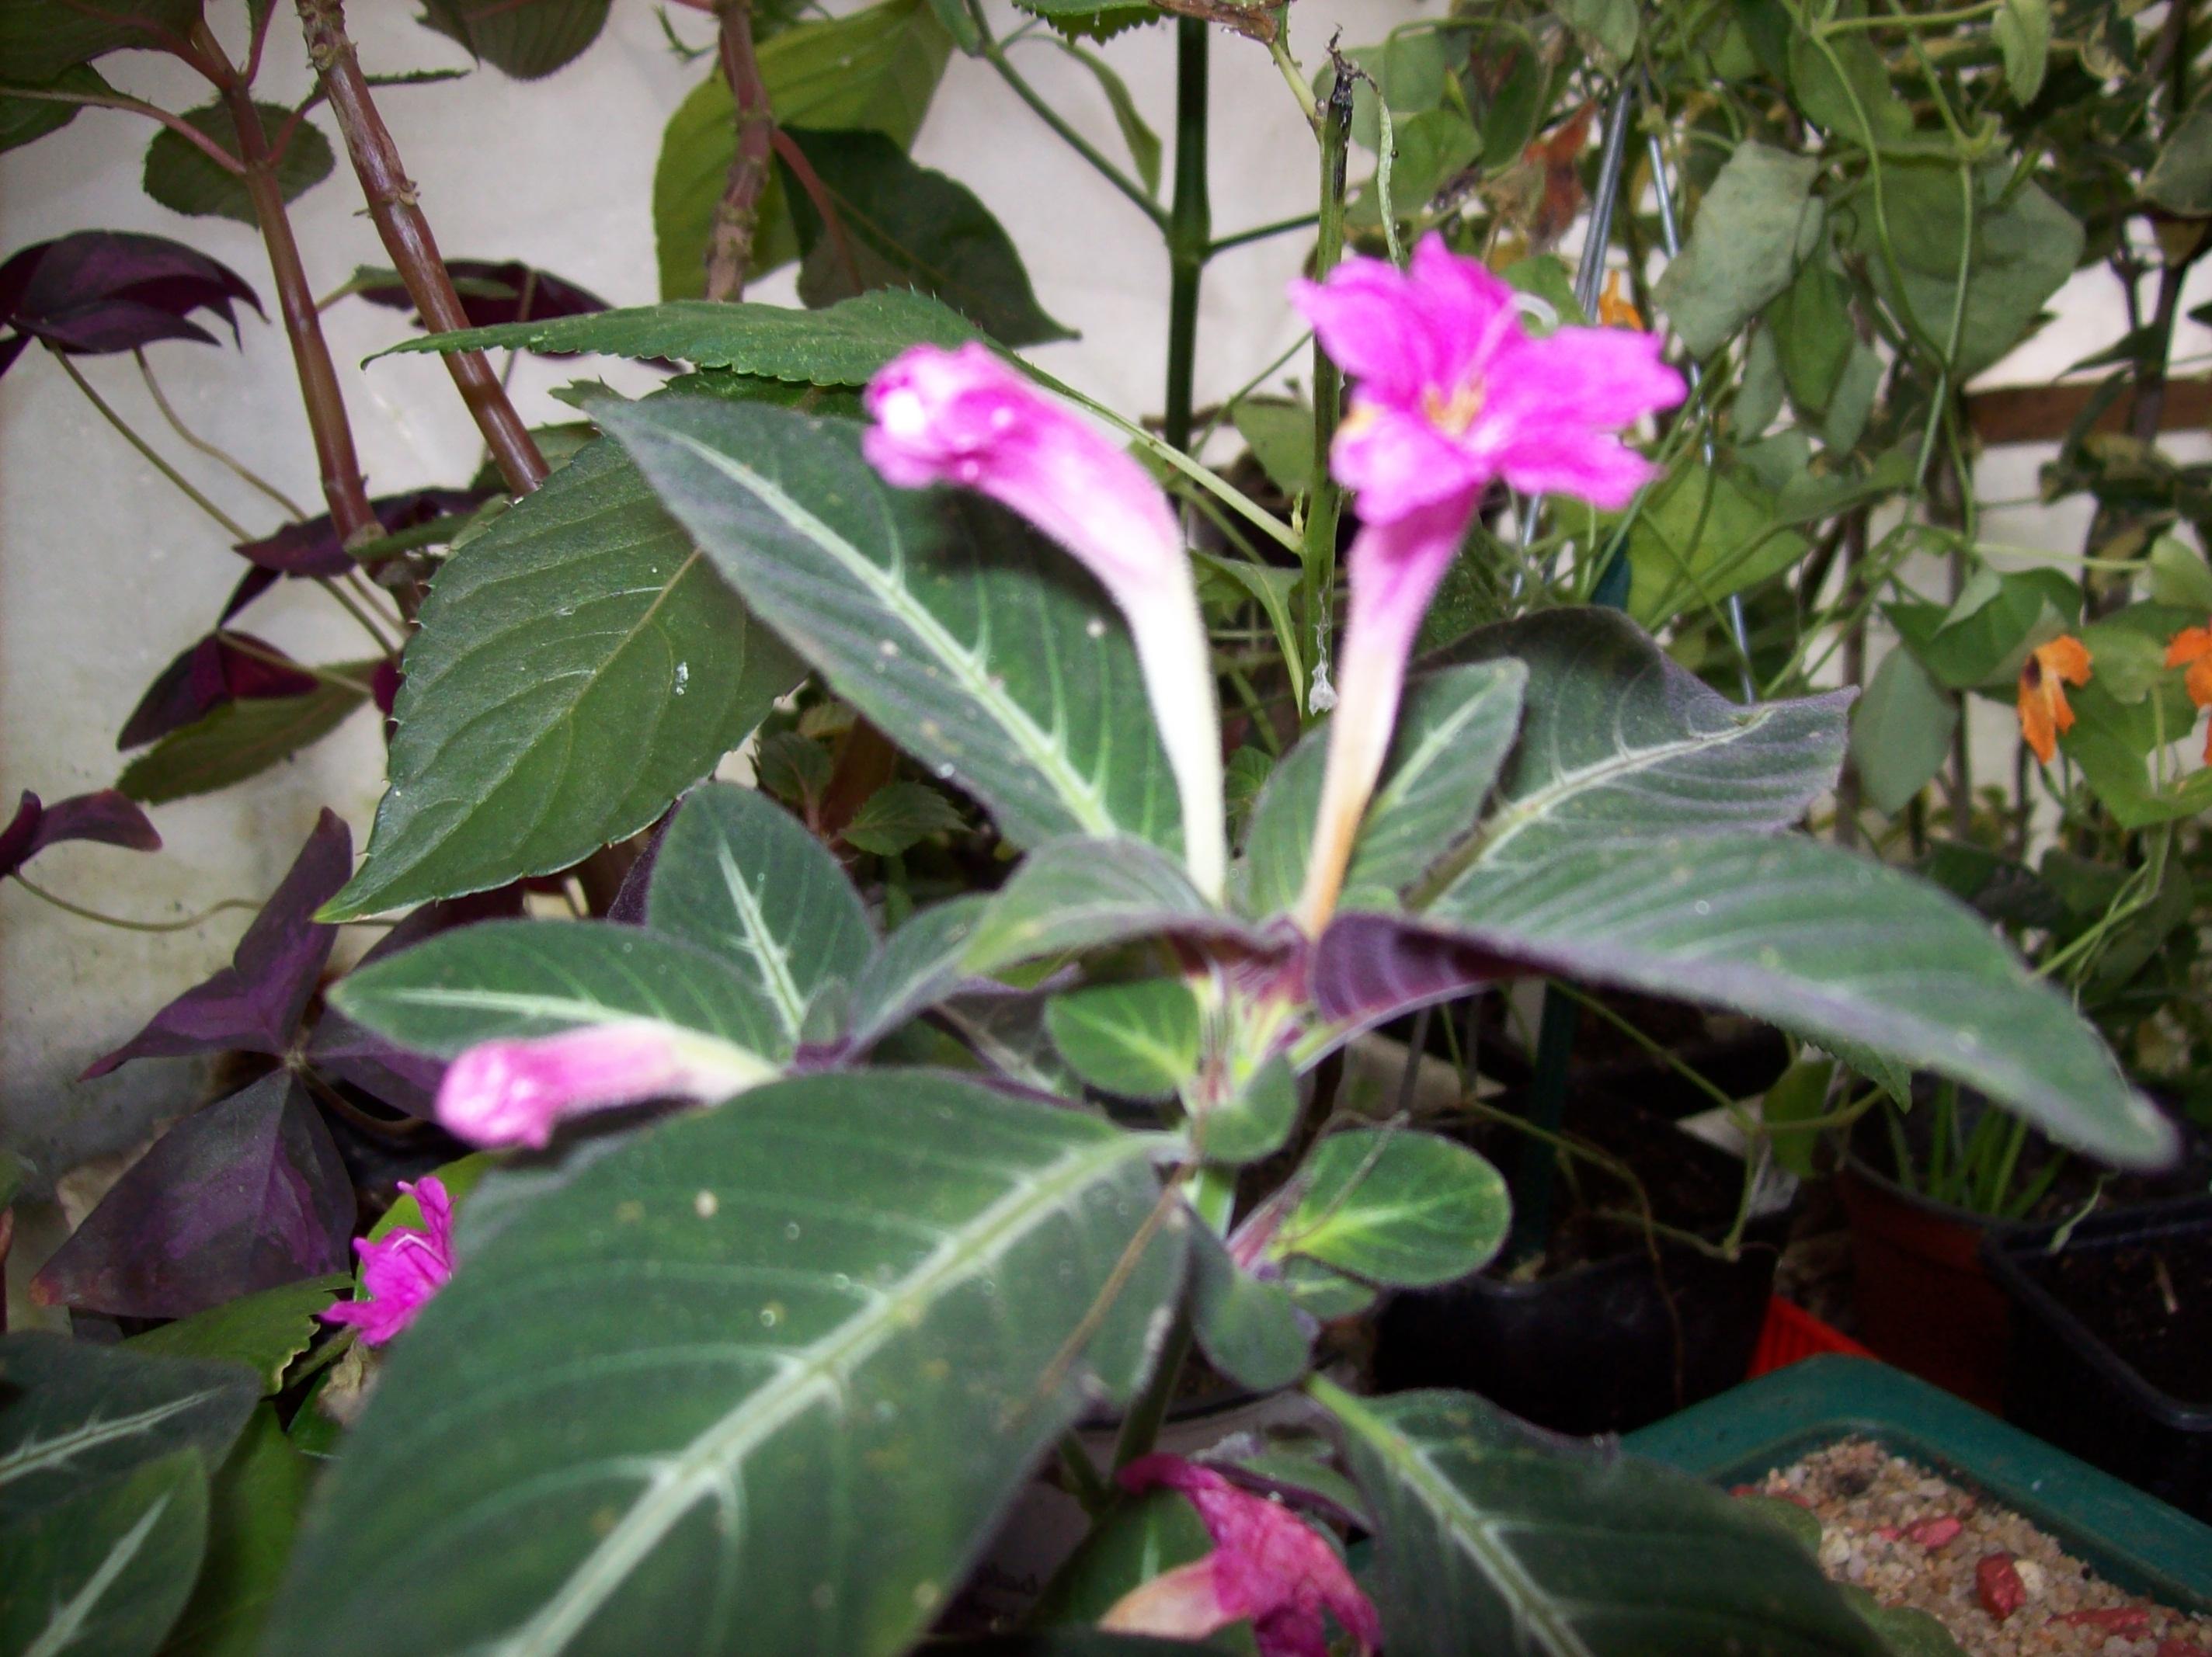 Quelques photos de plantes en fleurs en ce moment 332264ruelliamakoyanaJPG